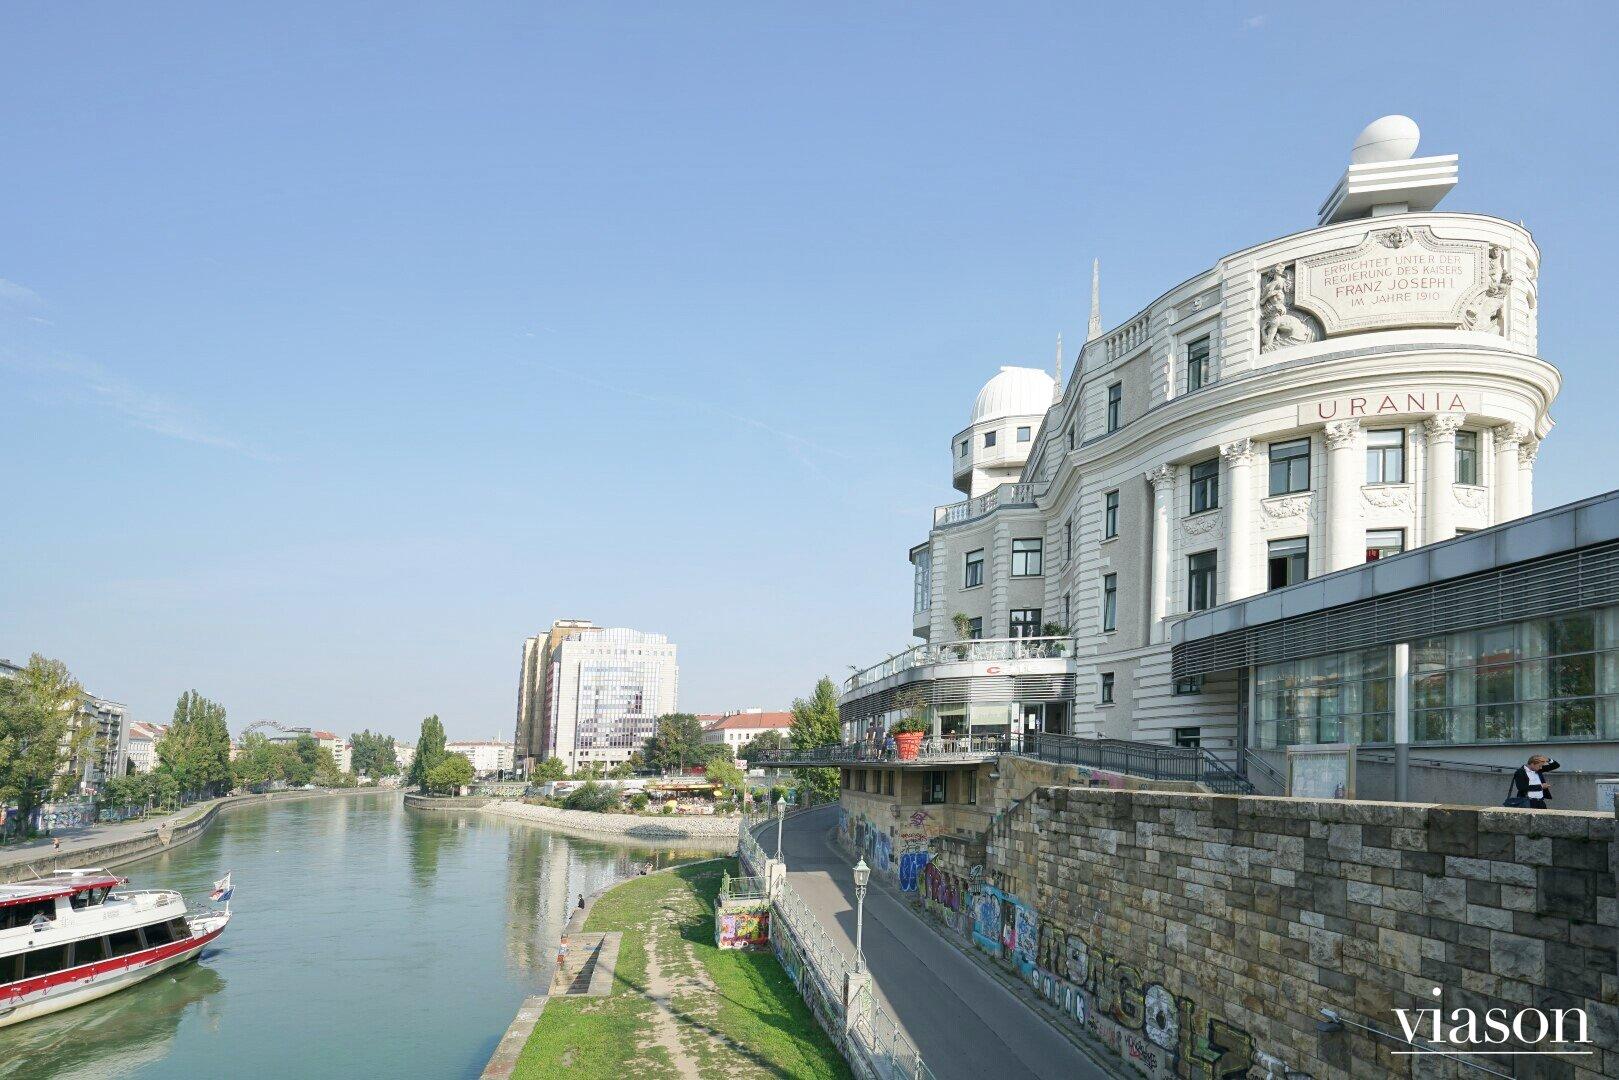 Urania am Donaukanal